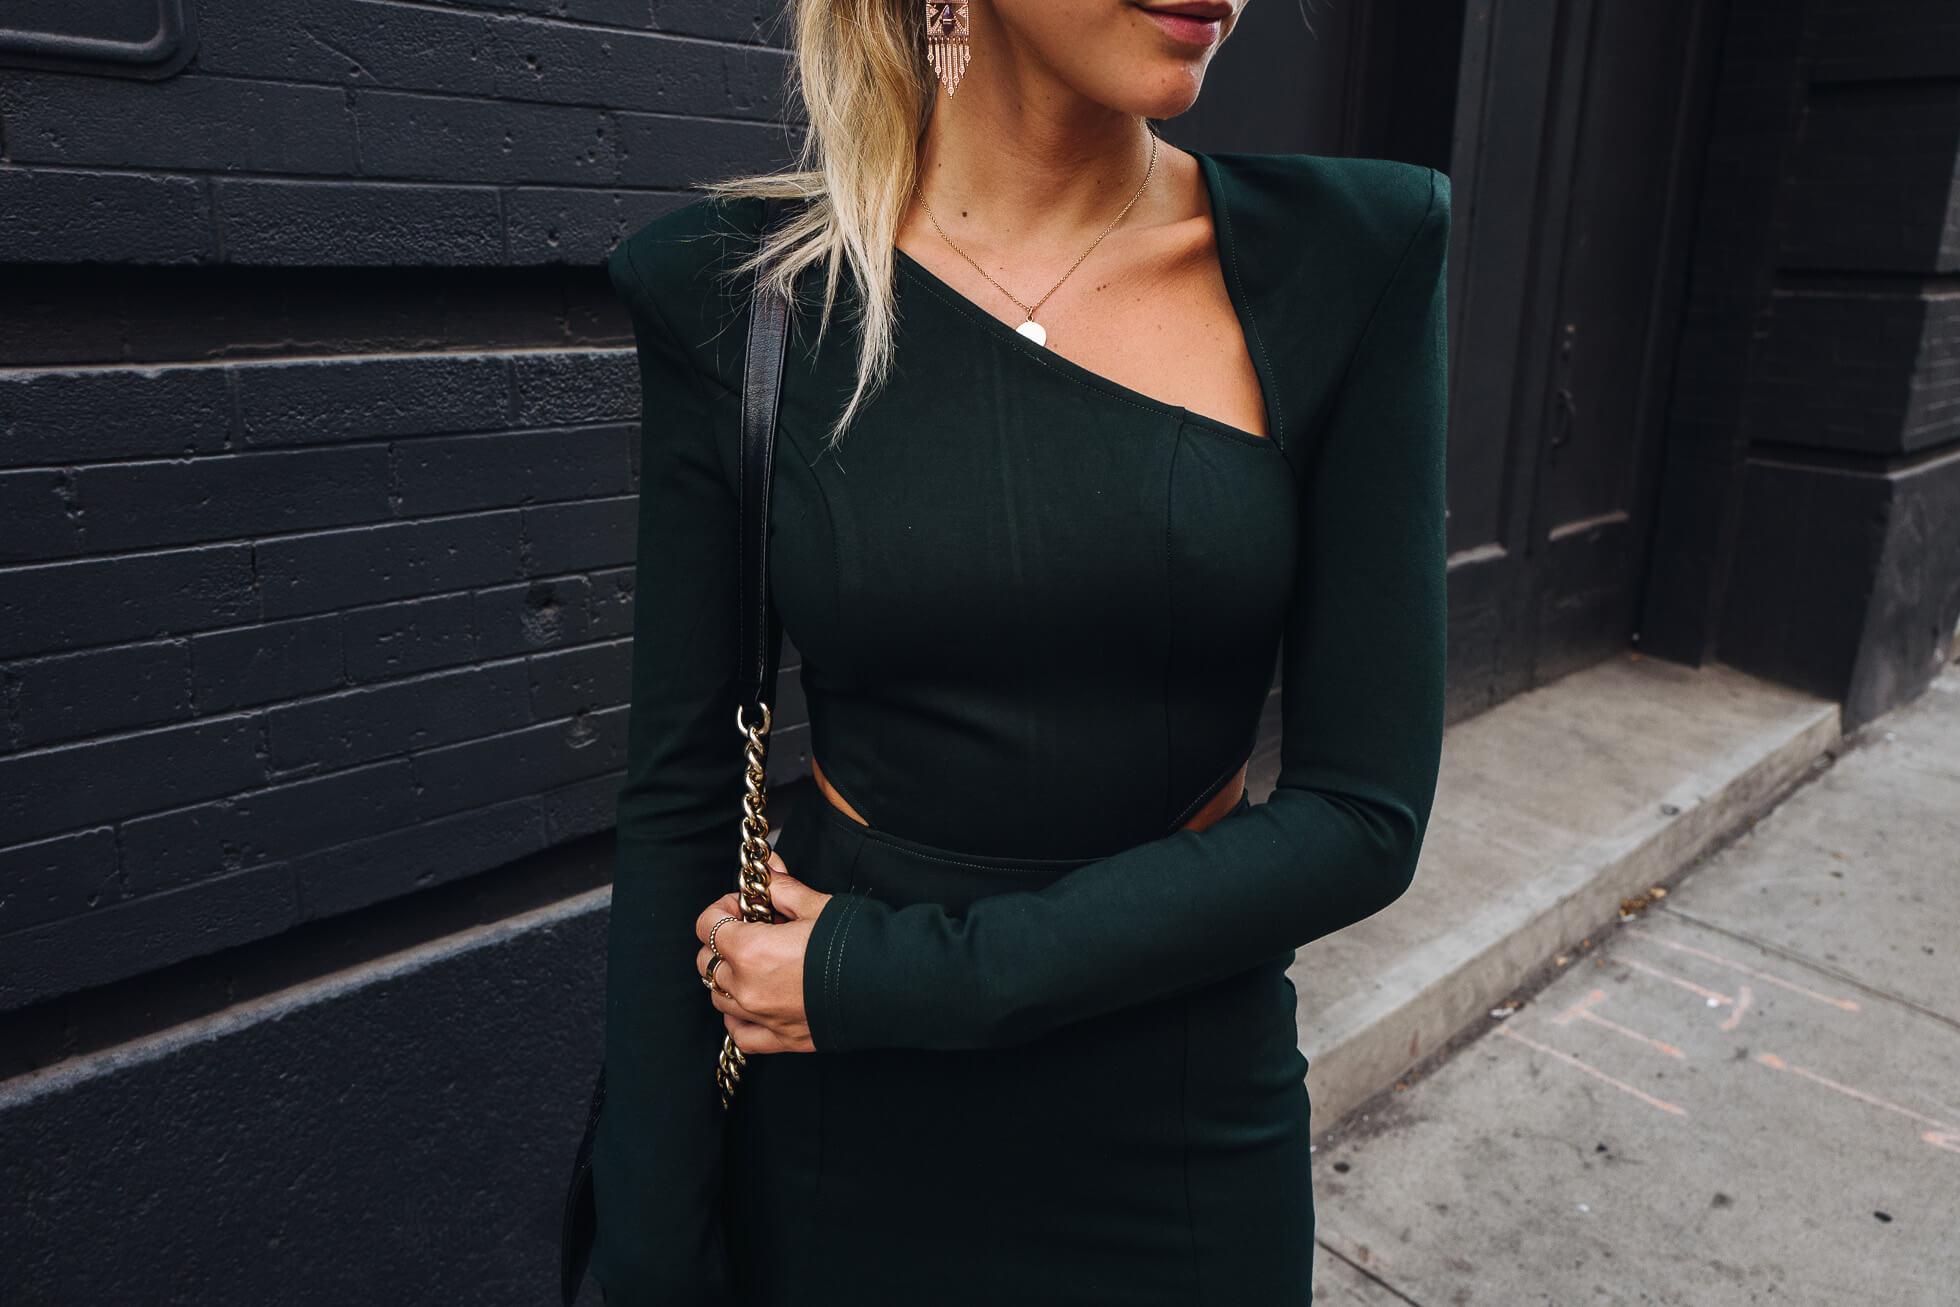 janni-deler-green-dressL1090694-Redigera